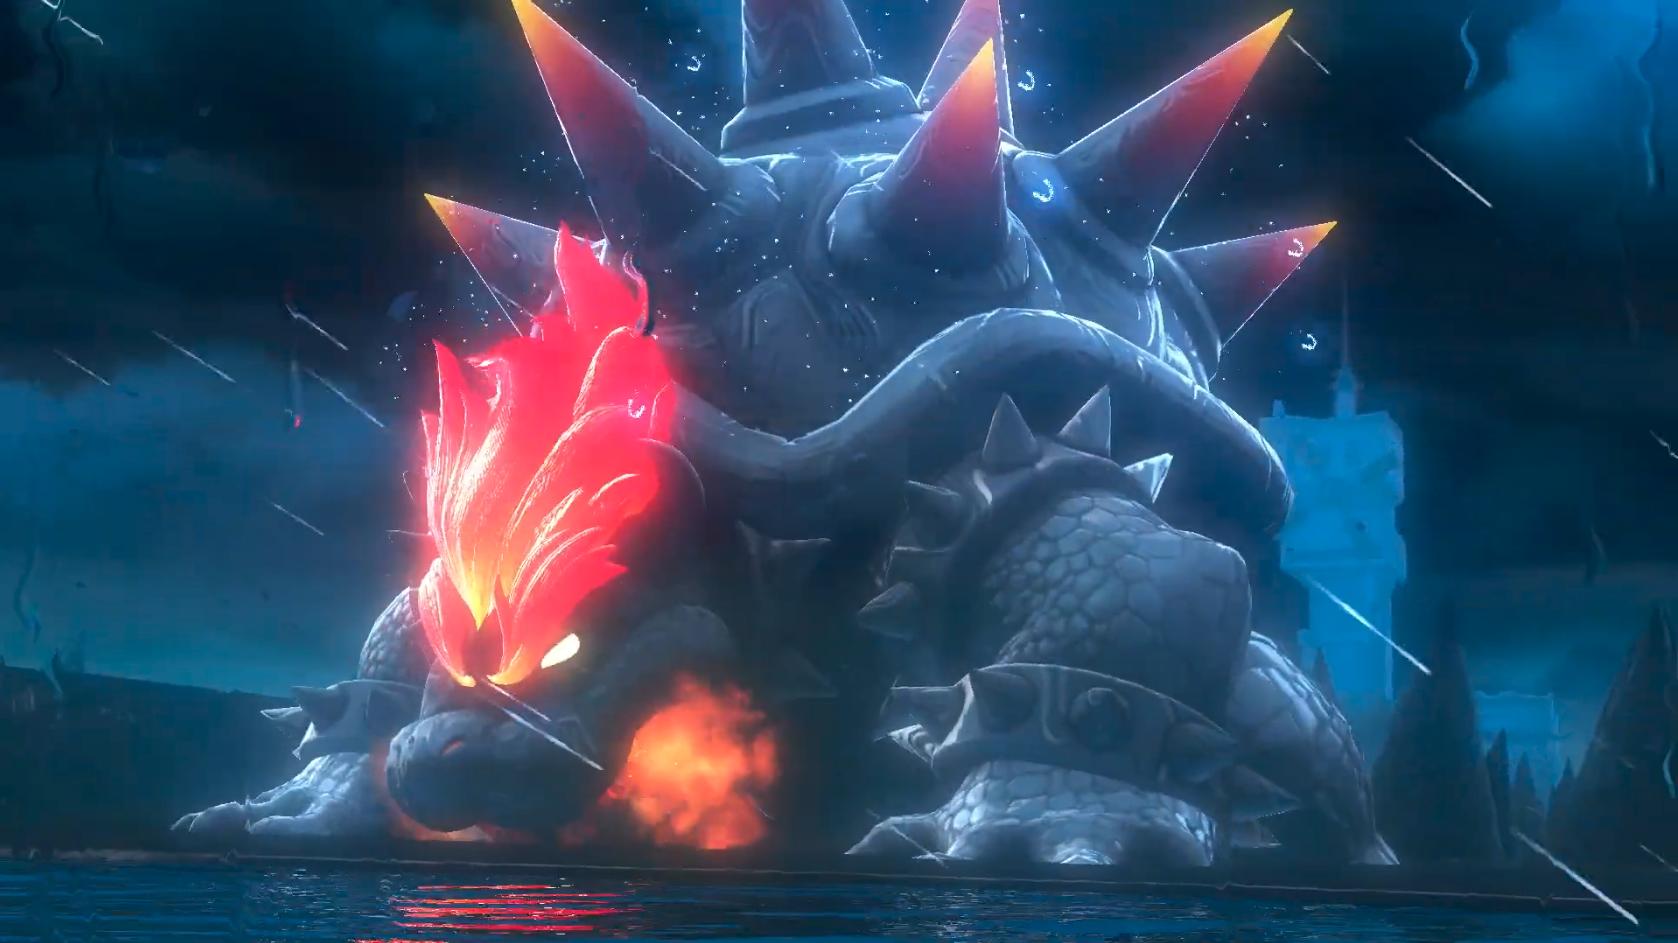 A Bigger Badder Bowser - Super Mario 3D World + Bowser's Fury - Nintendo Switch Trailer